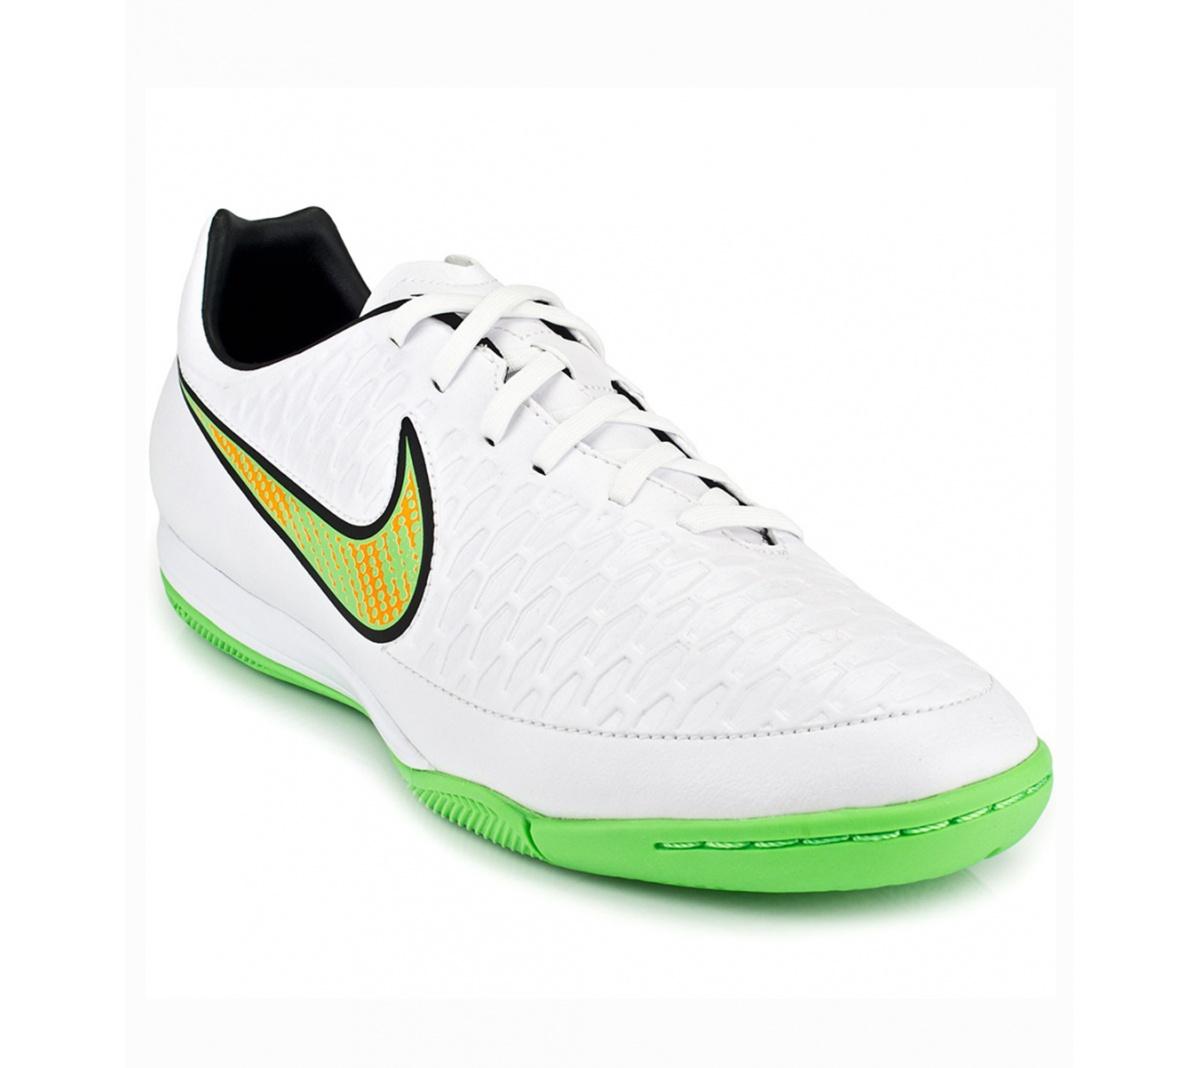 55163e8e36a44 Tênis Nike Magista Onda Futsal Tênis Nike Magista Onda Futsal ...